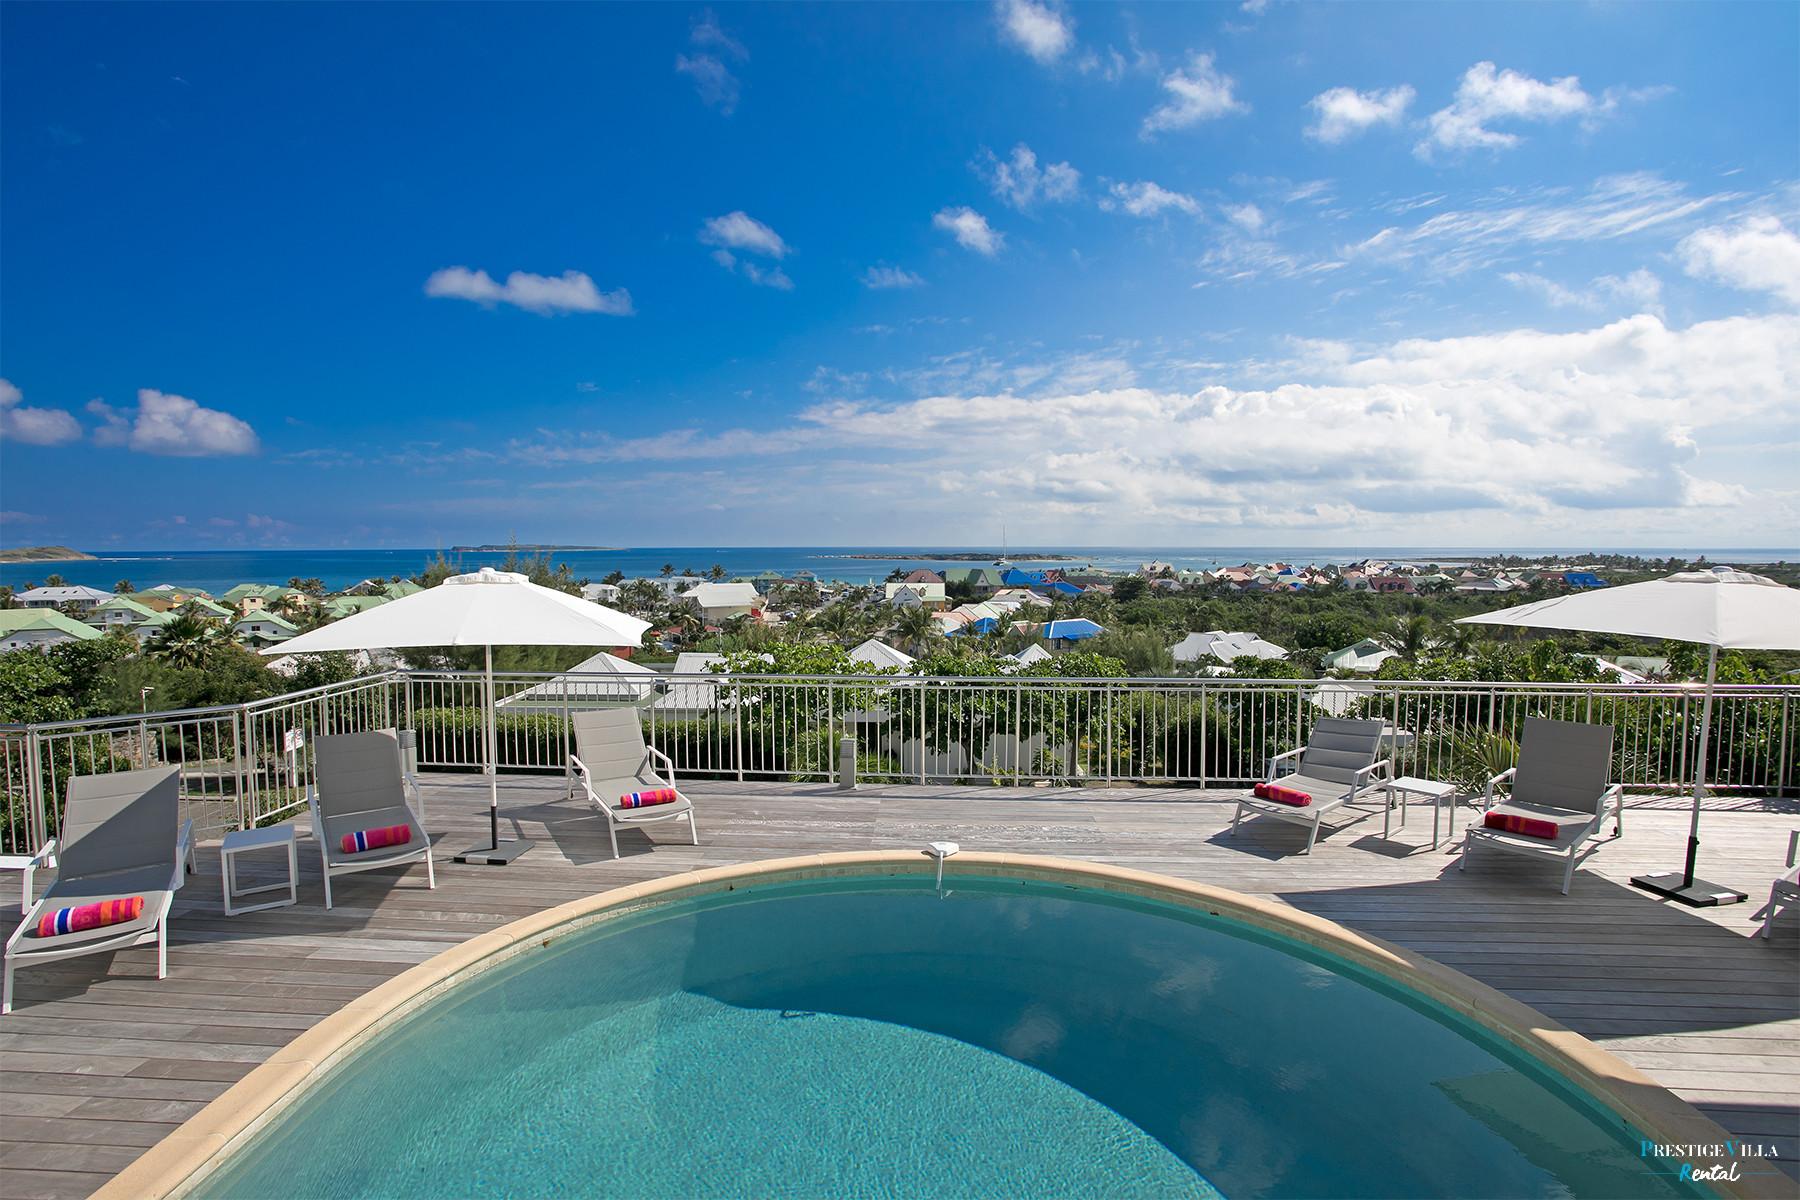 Villa/Dettached house in Orient Bay - Ocean View